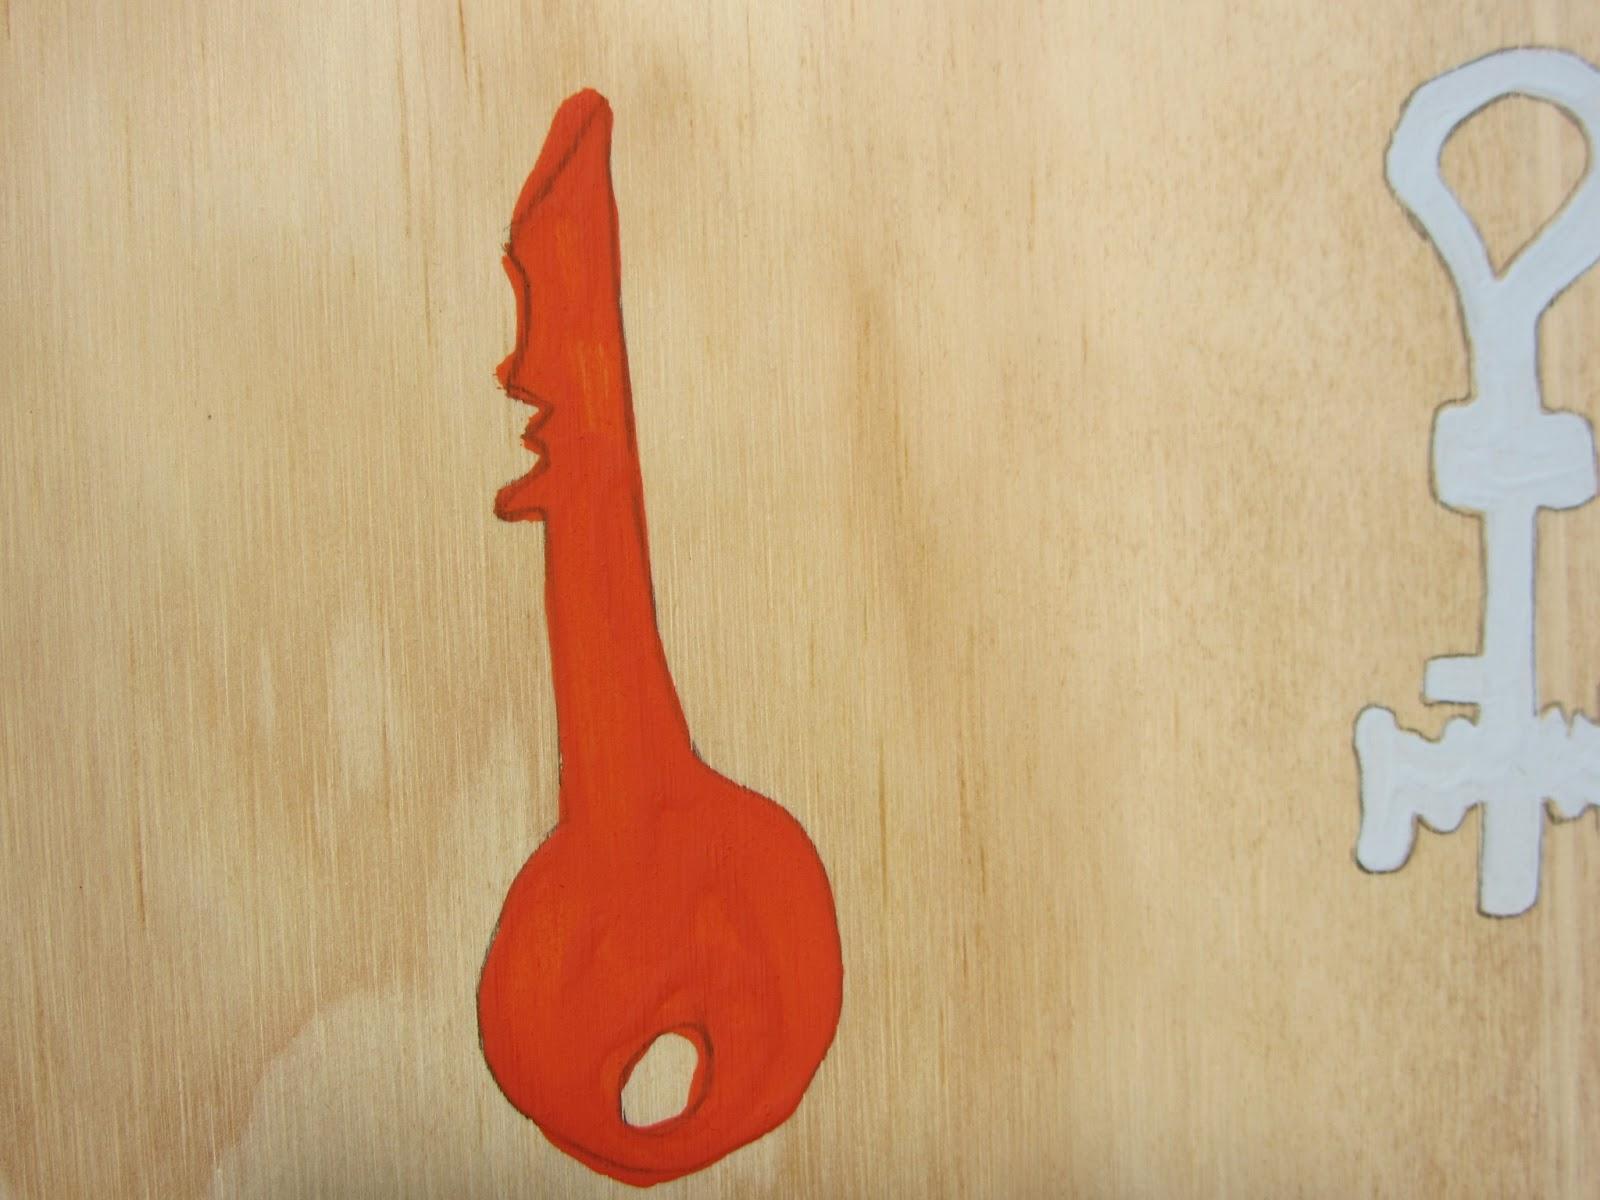 Thom Haus Handmade A Modern Take On Traditional 21st Birthday Gift